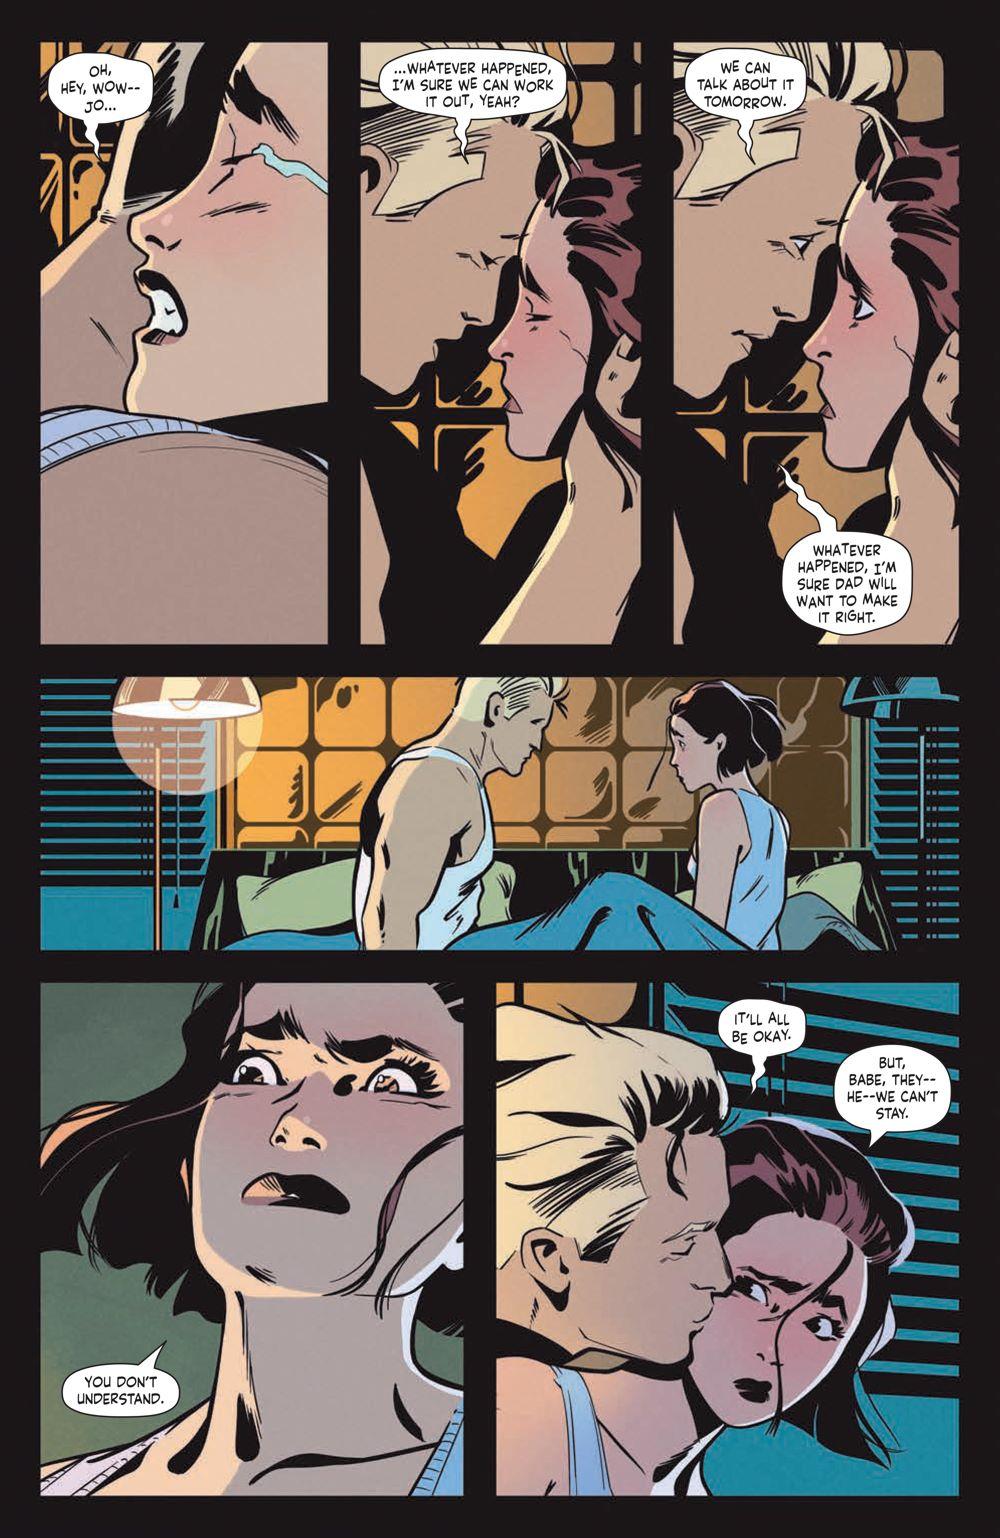 EatRich_002_PRESS_7 ComicList Previews: EAT THE RICH #2 (OF 5)